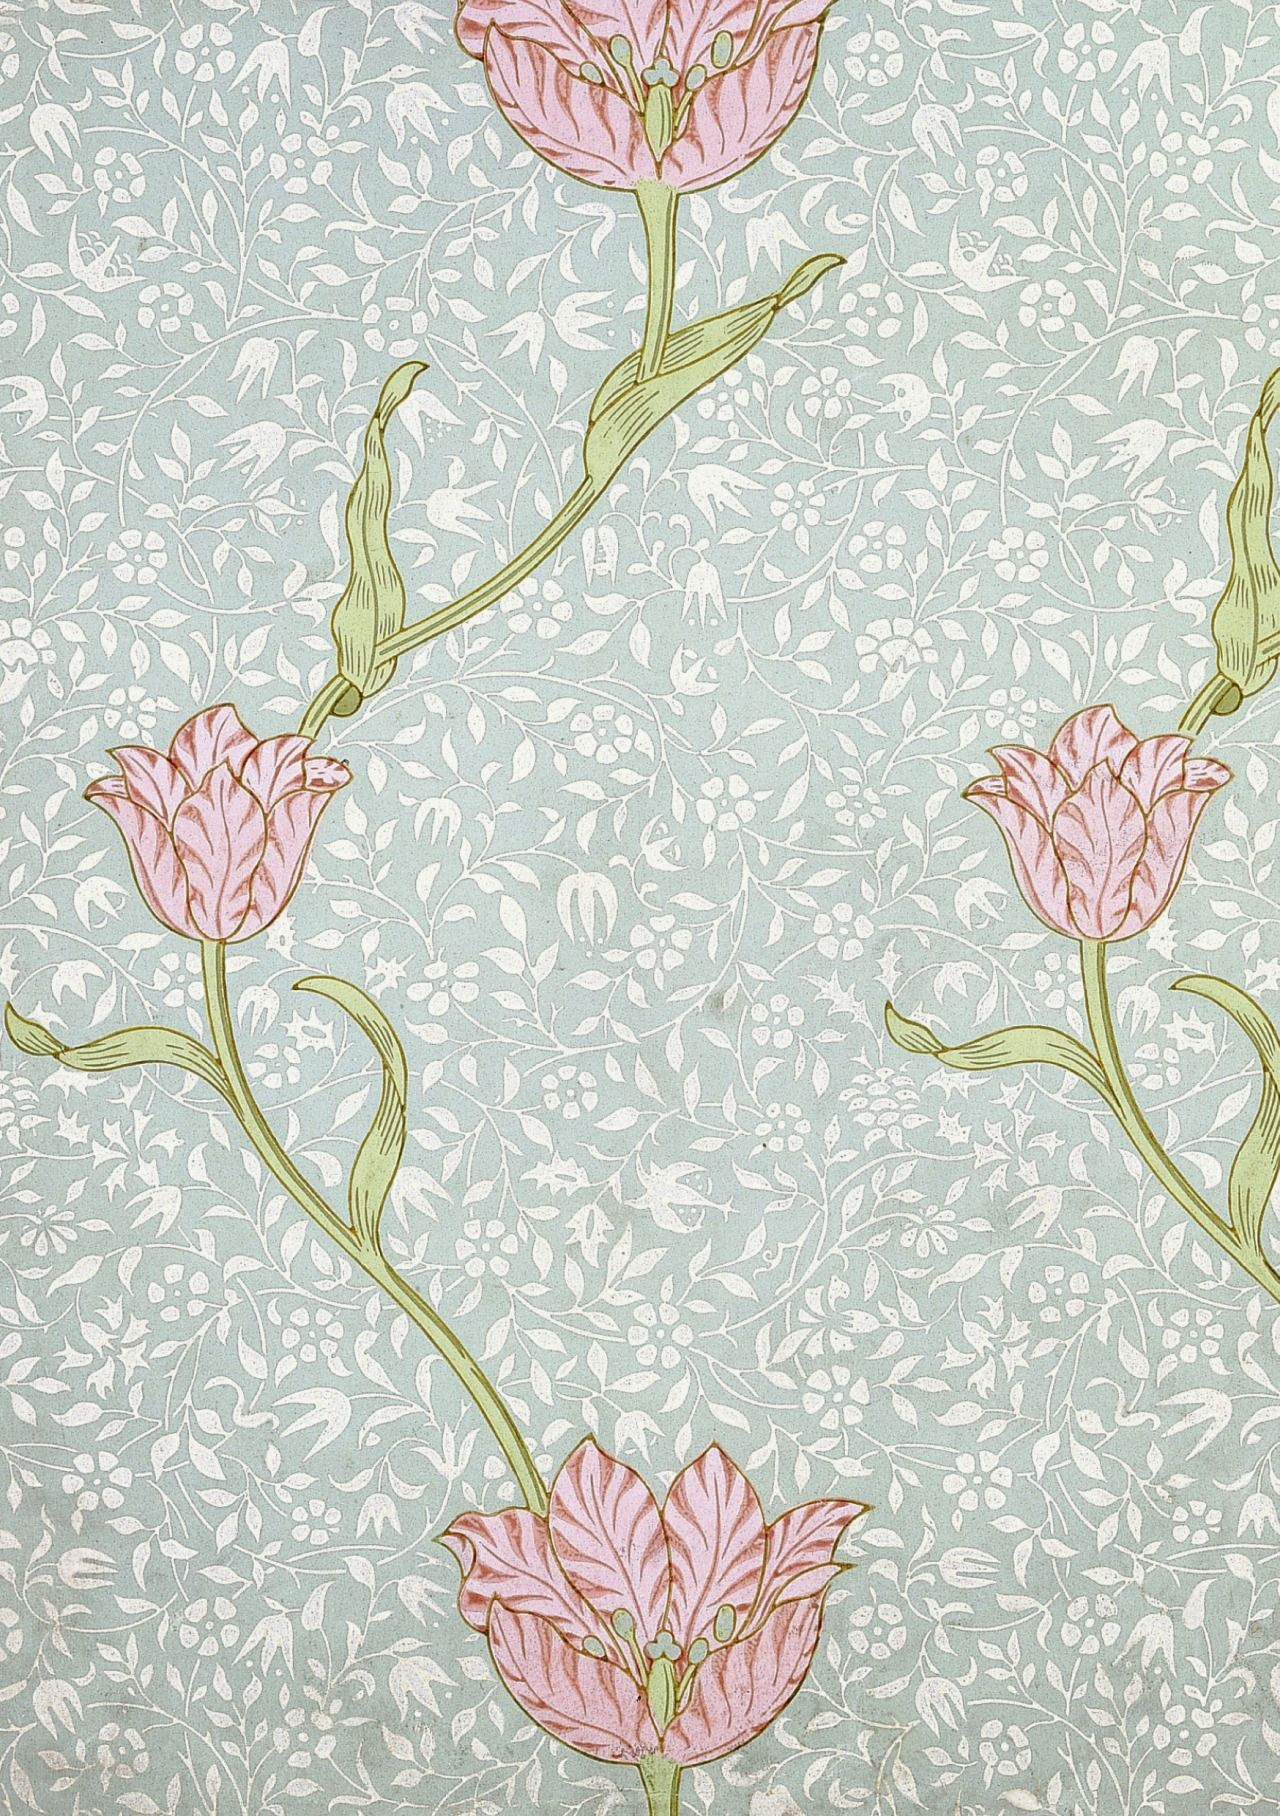 thevisualremix: William Morris Print M U S E A N D J A C K A L O P E ...